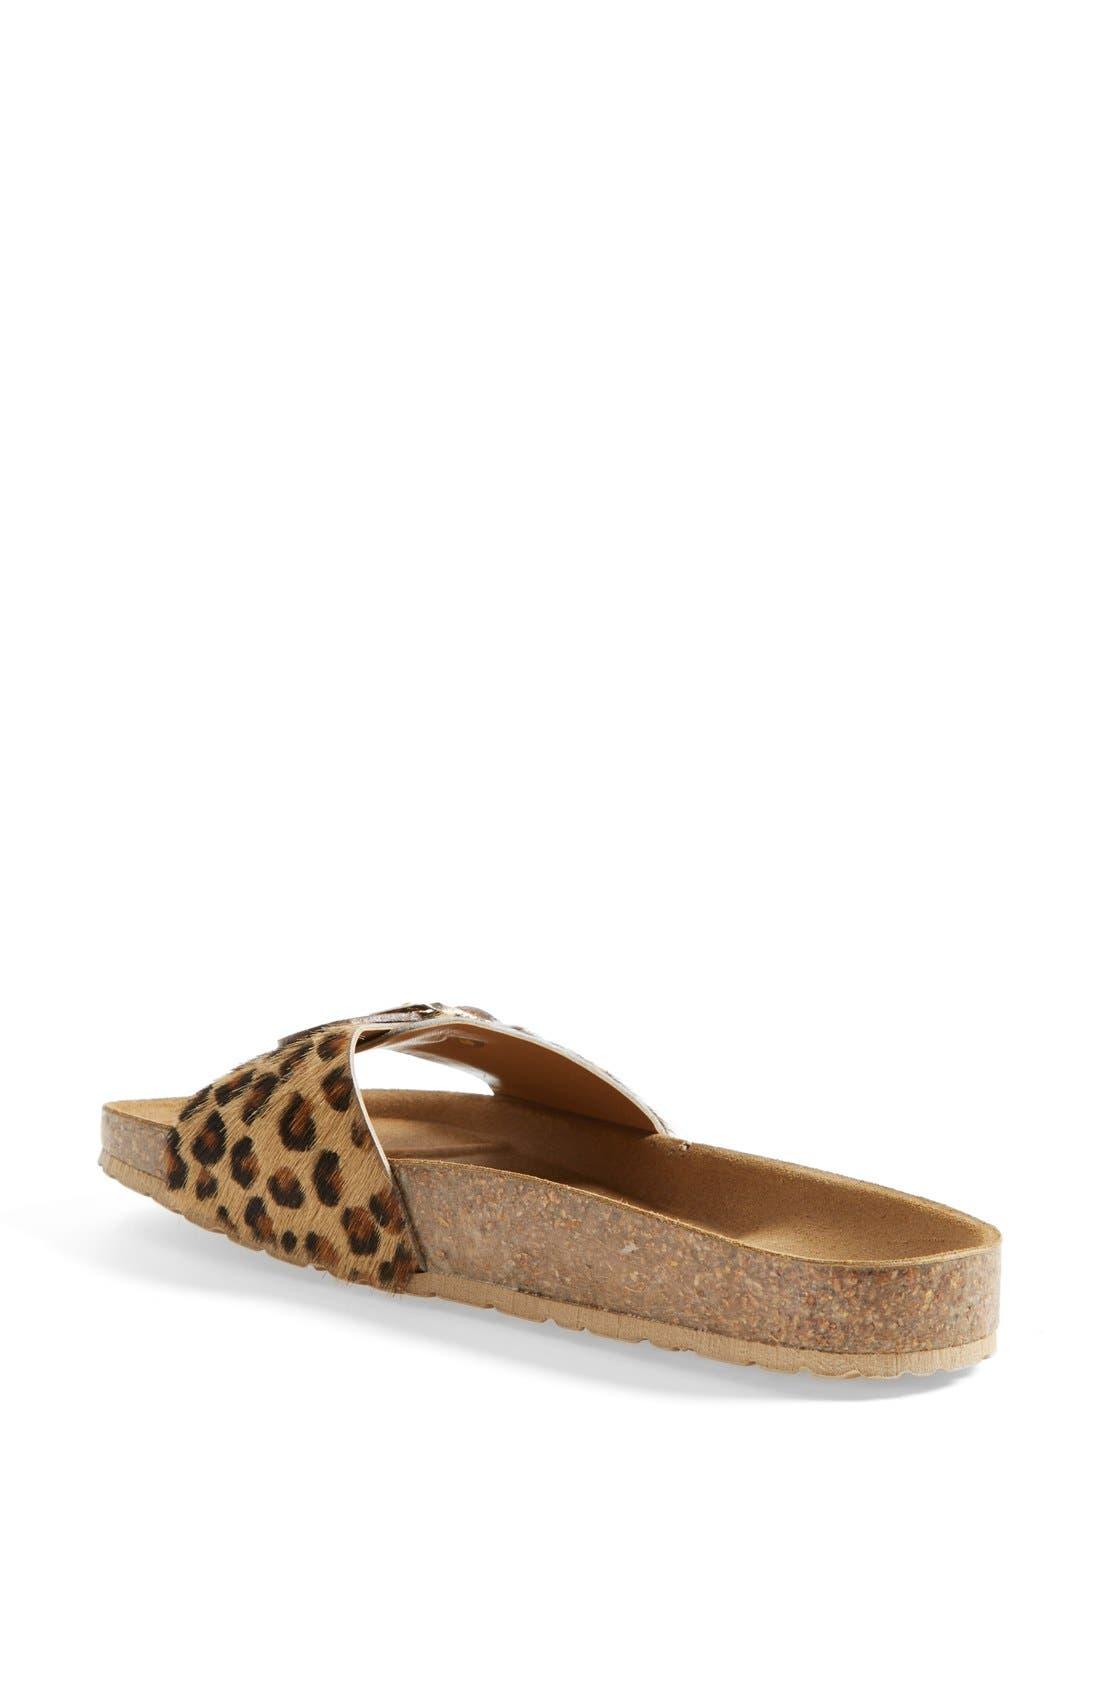 Alternate Image 2  - Seychelles 'So Far Away' Leopard Print Calf Hair Sandal